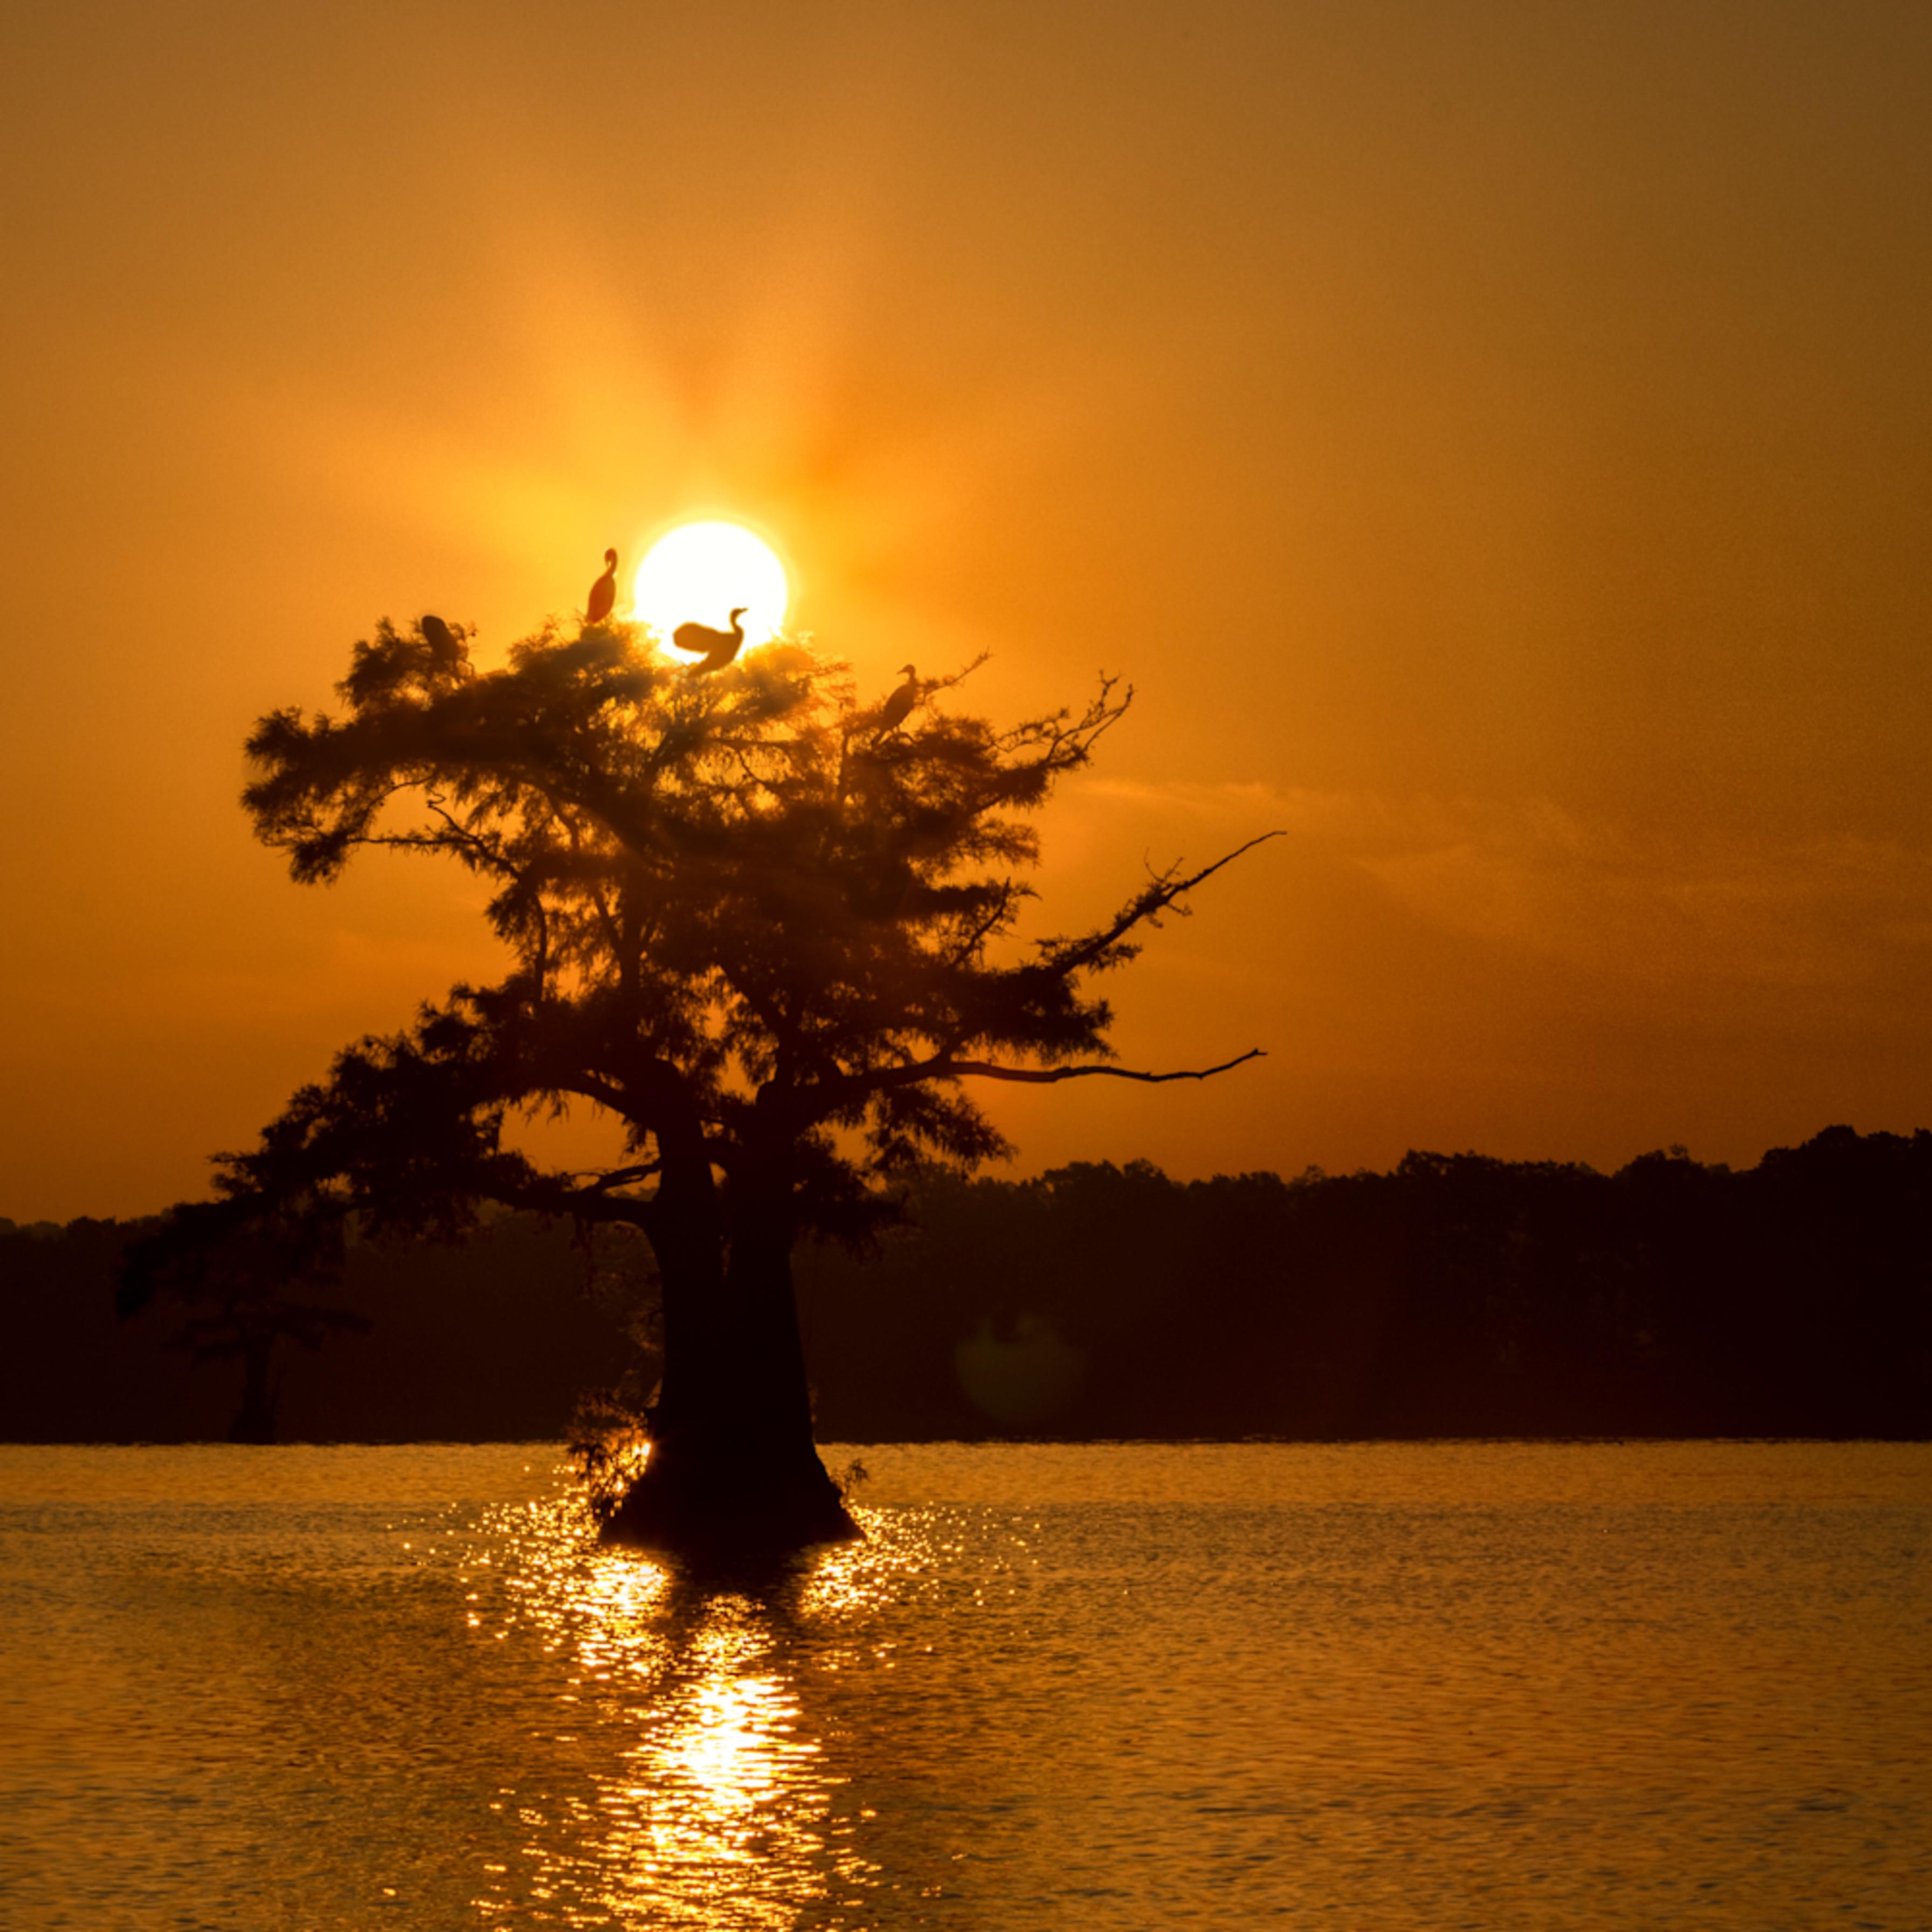 Sunsize cormorant tree  tm mg 8534 rlt20 mnp45o